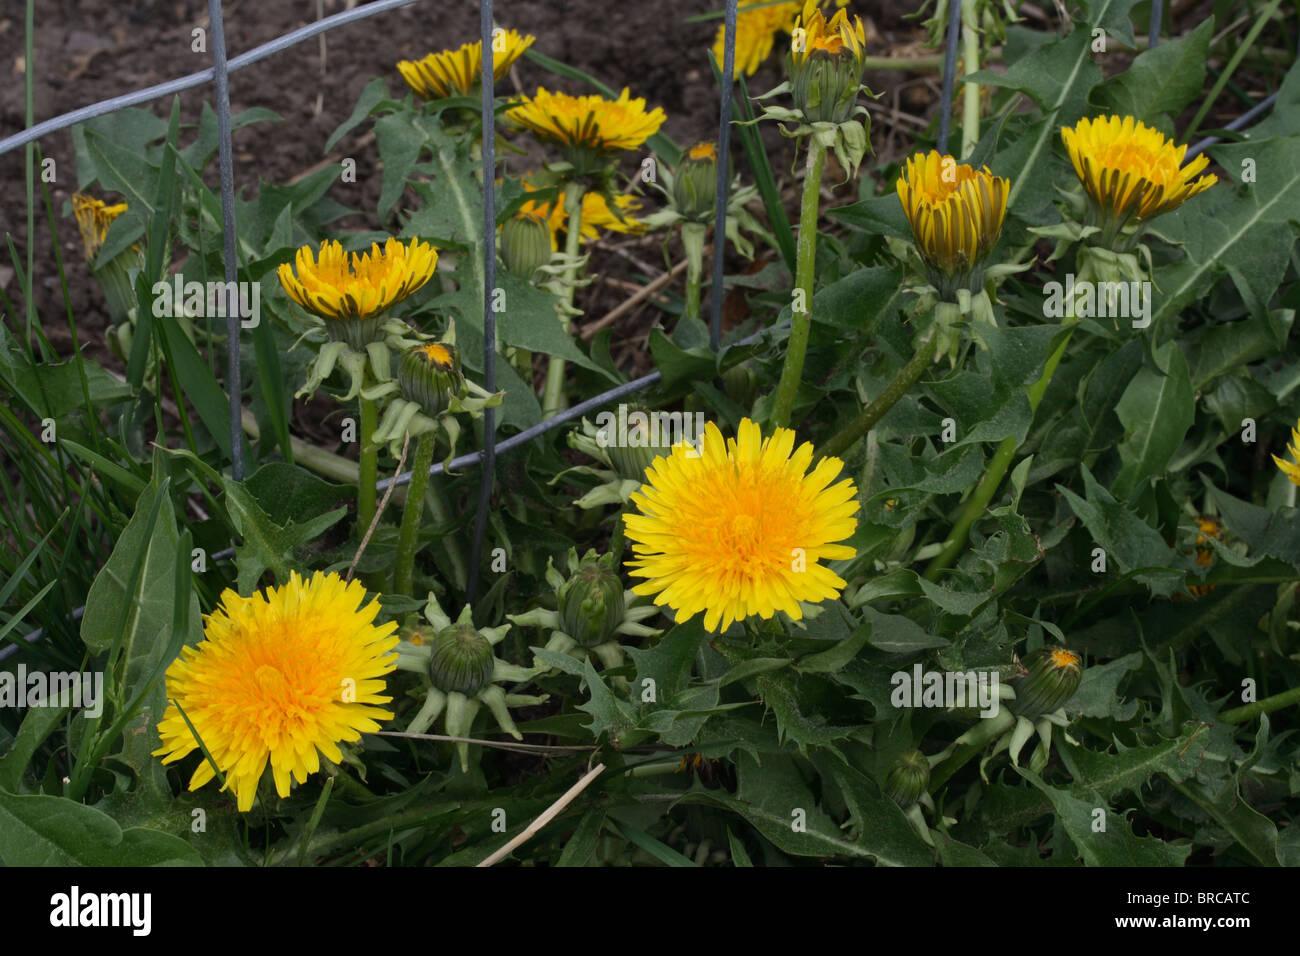 Dandelion Plant in Bloom -  Lawn Weeds - Stock Image